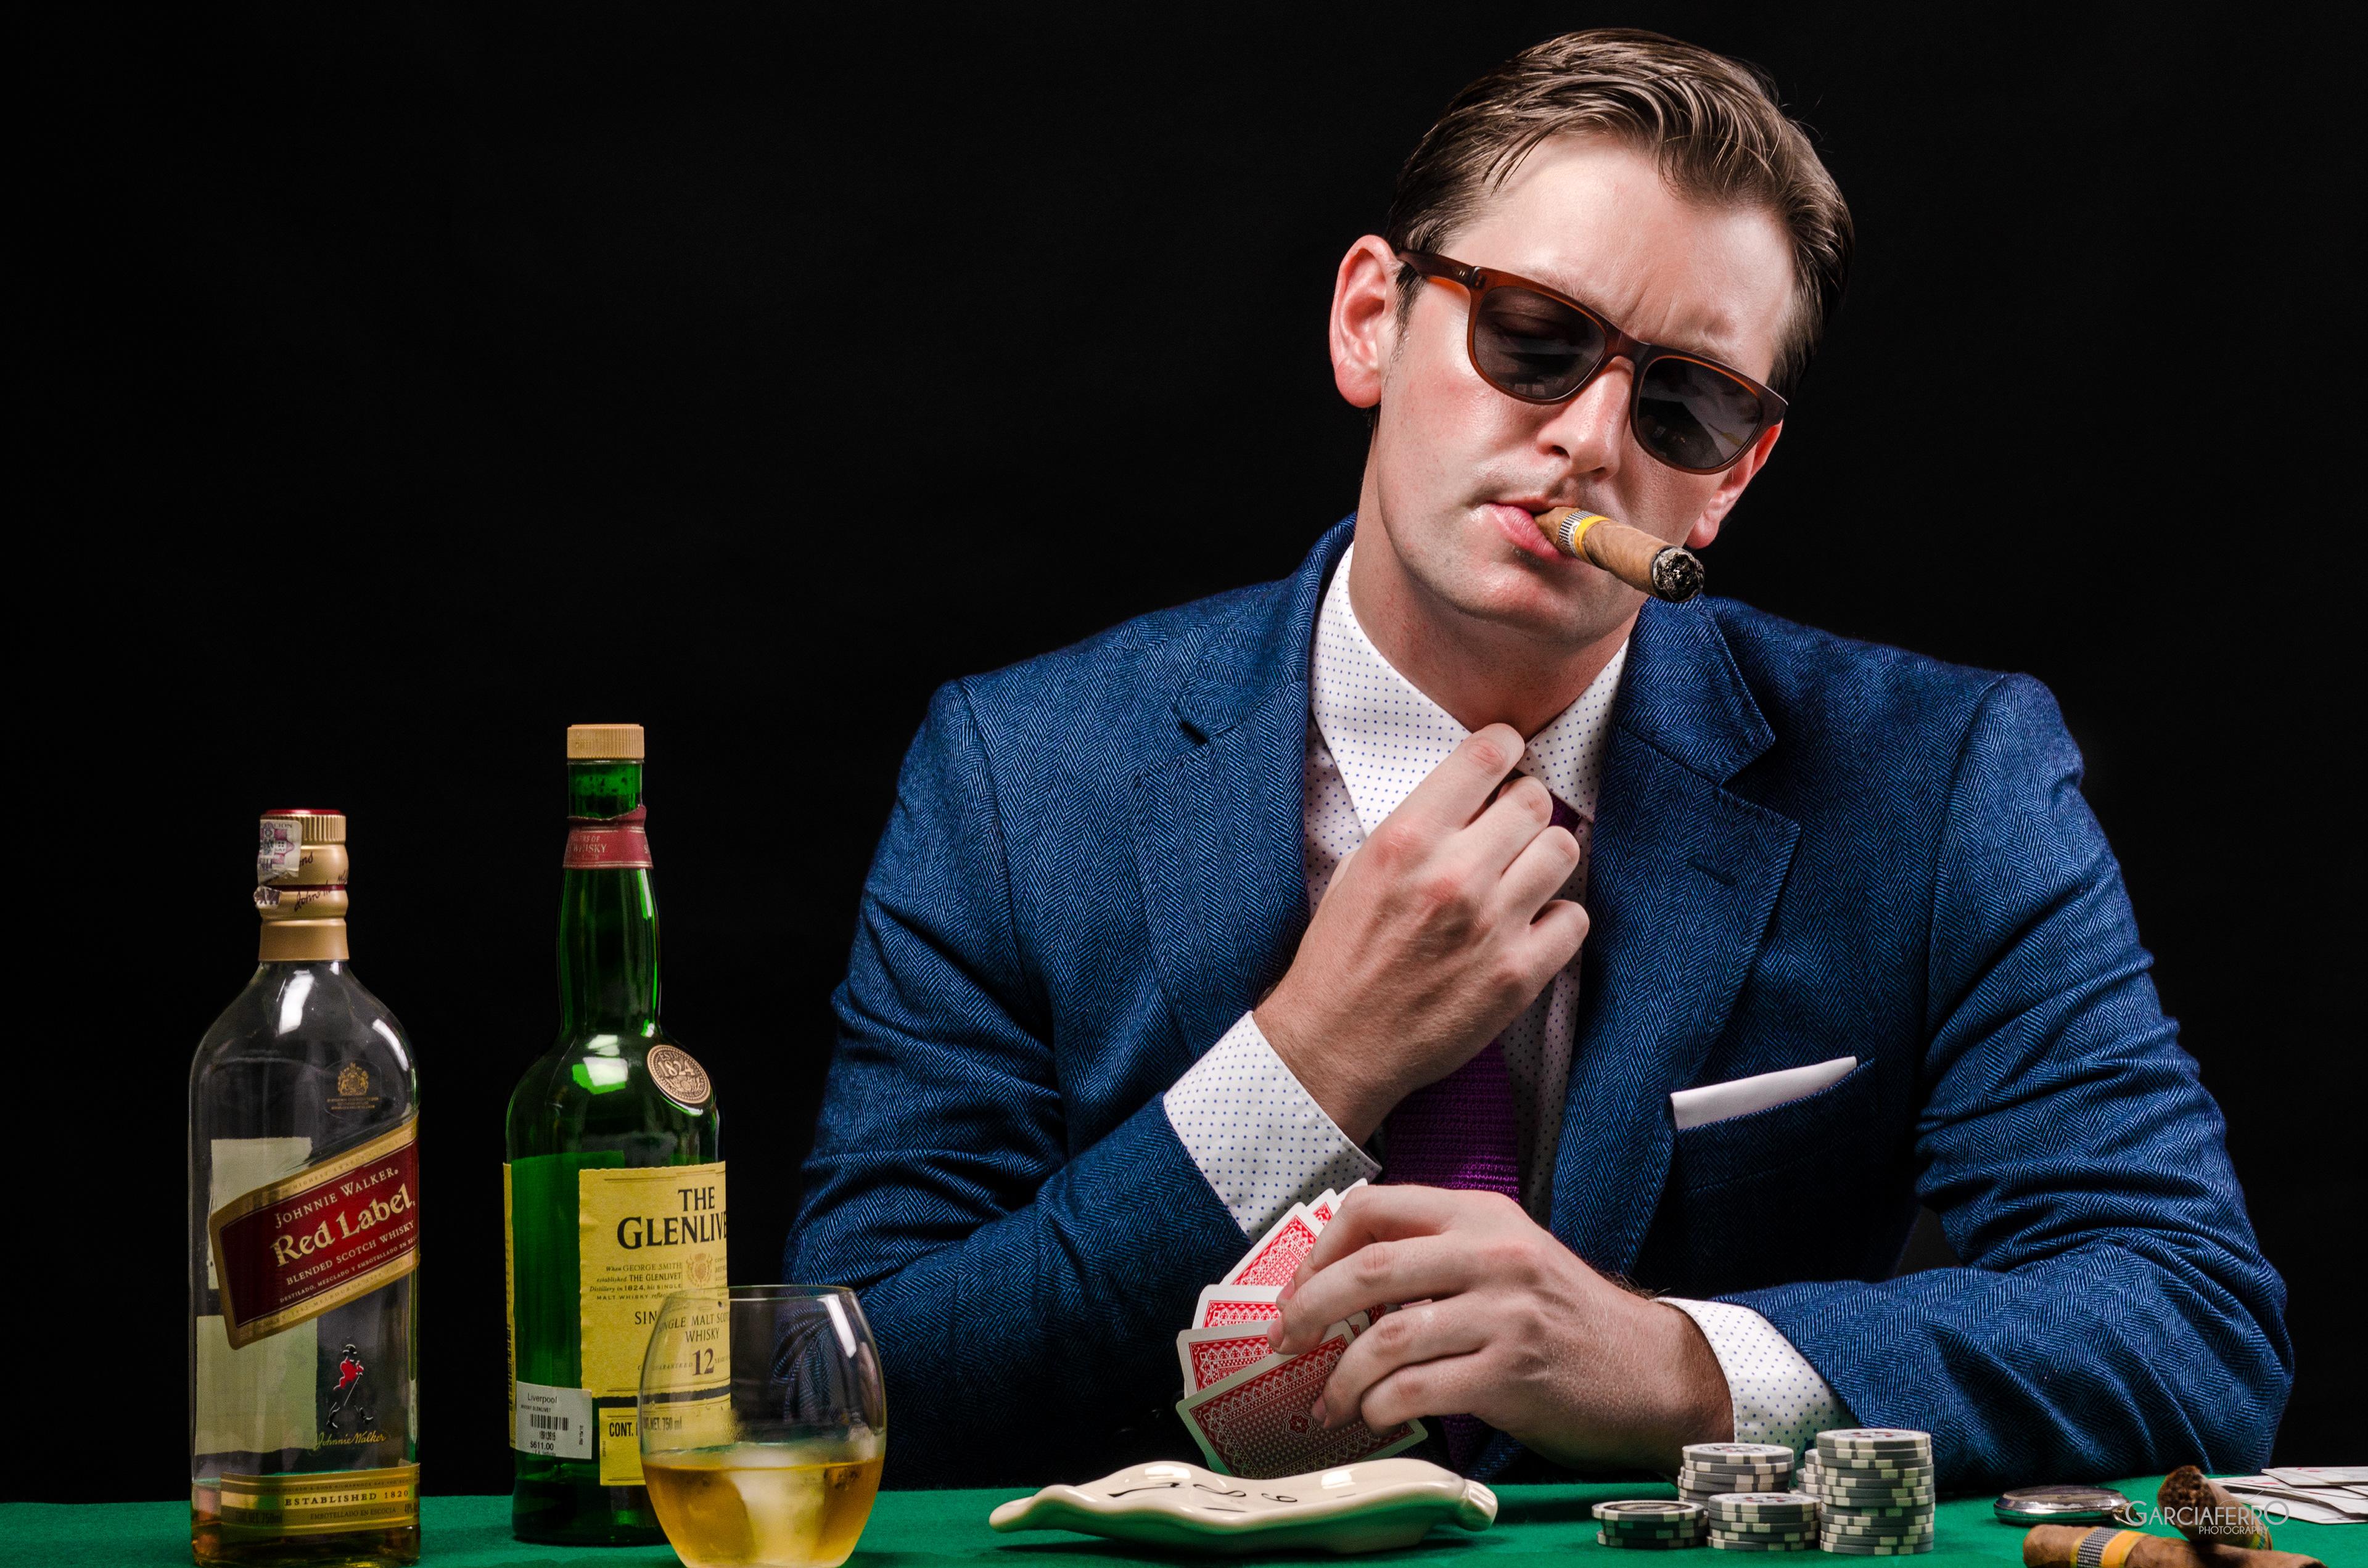 Tetap tenang, atau berikan penampilan tenang | Poker Online